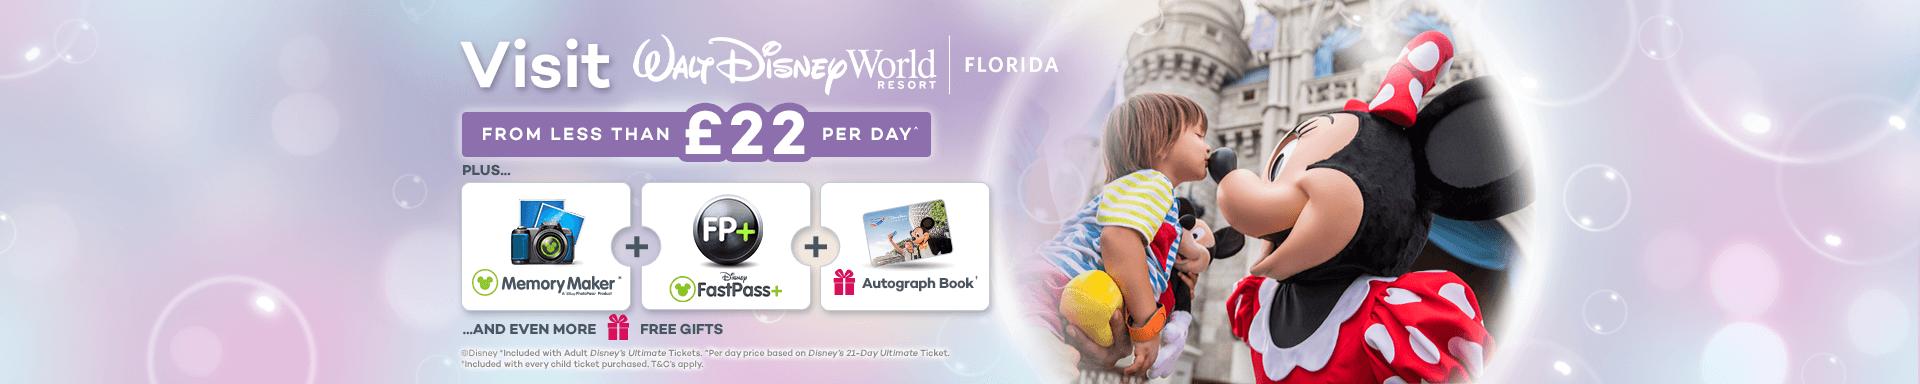 Attraction Tickets Direct: Orlando Park Tickets | Florida